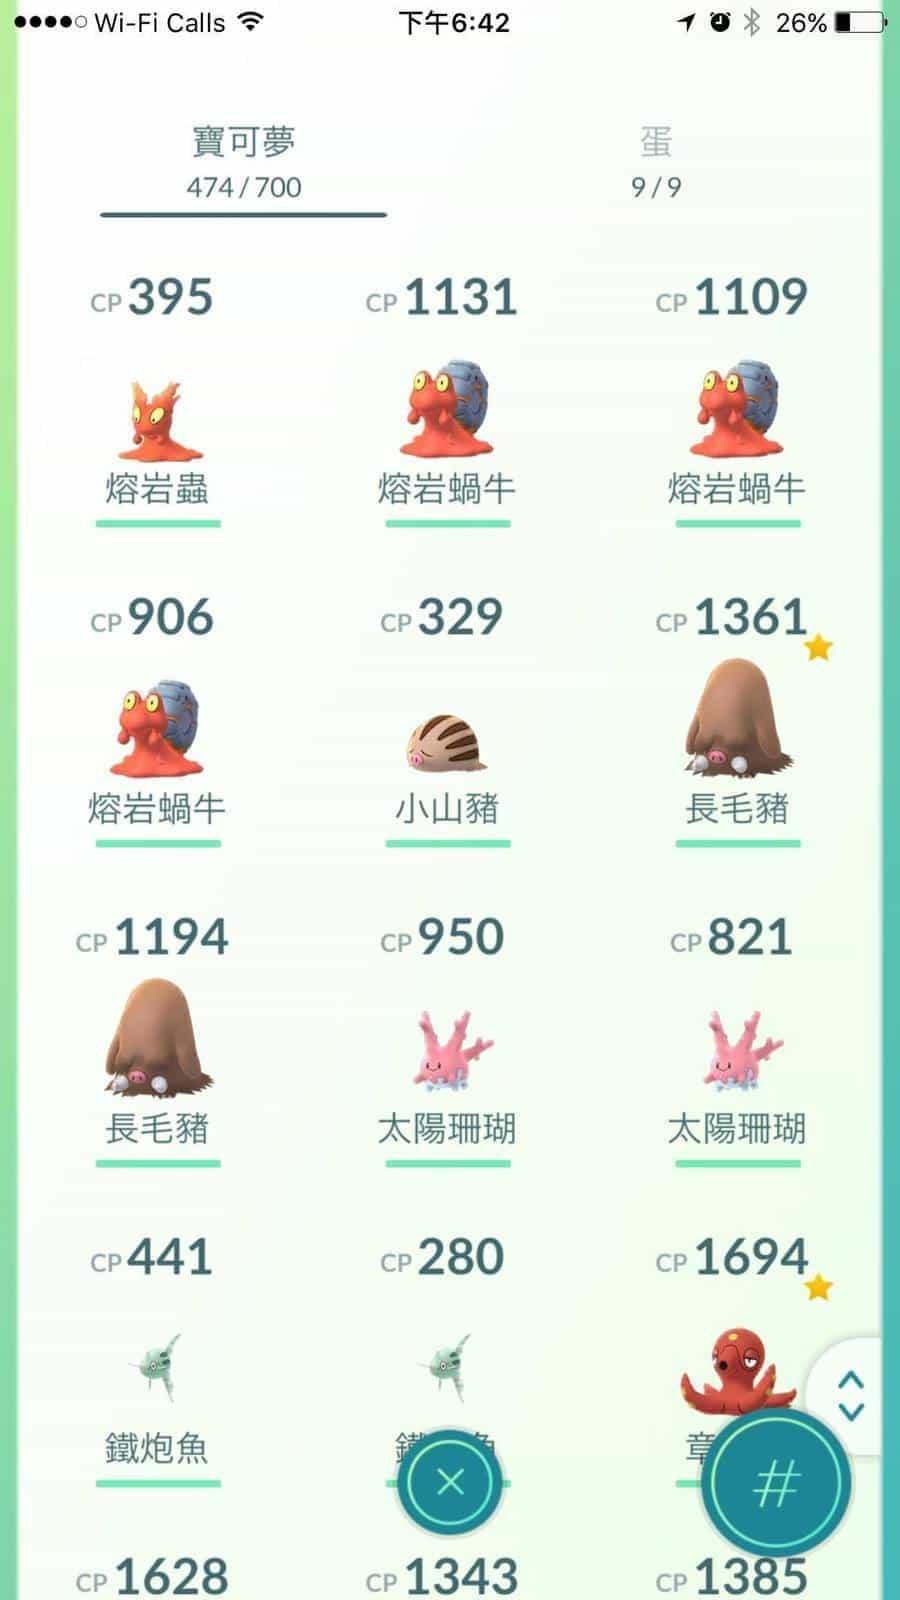 《Pokemon GO》中文更新教學 香港 + 臺灣精靈譯名混合 - 香港 unwire.hk